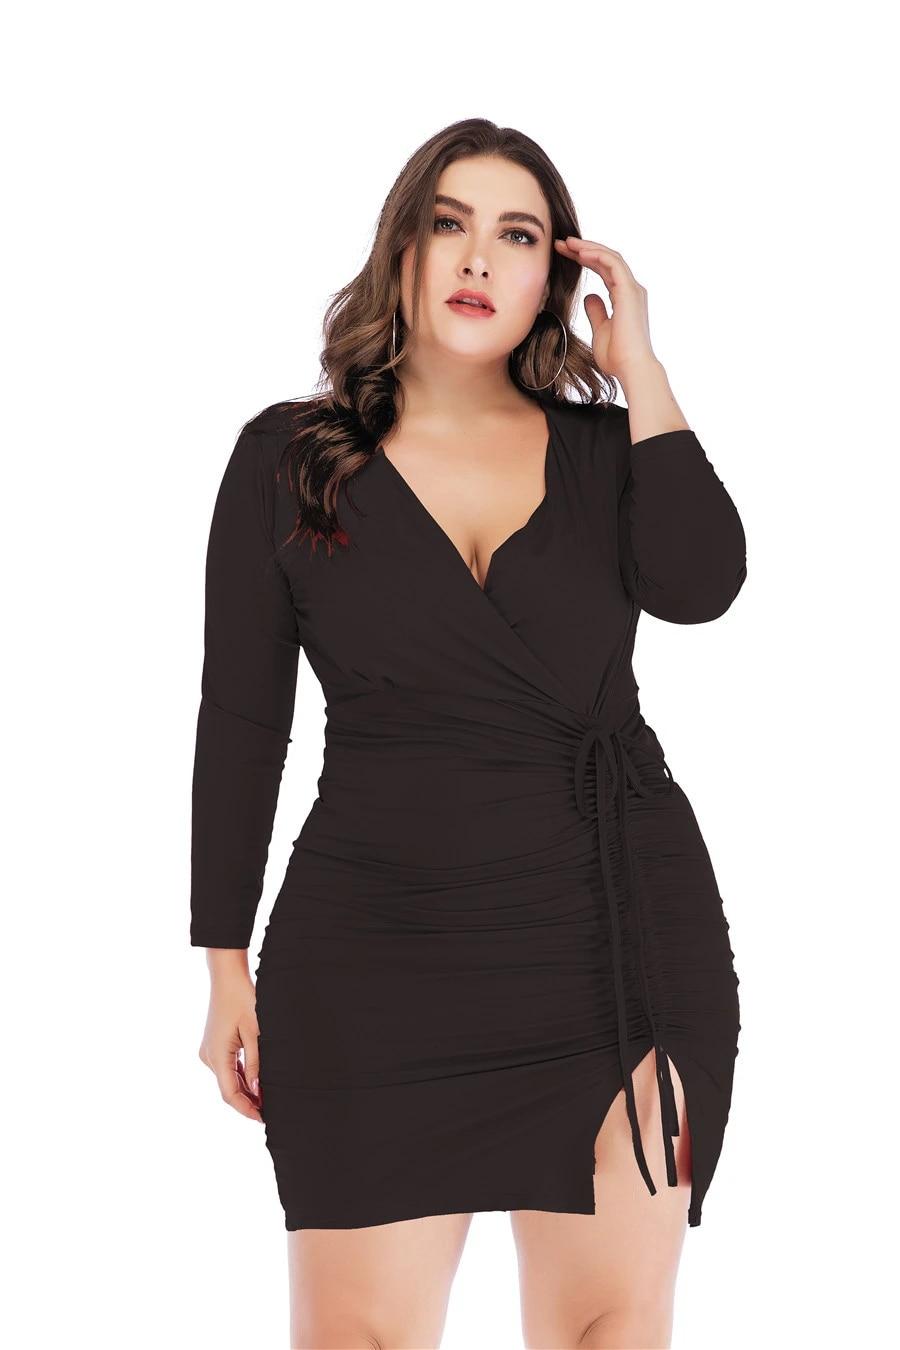 women dress plus size autumn 8 long sleeve cotton red vestido negro  short tight v neck vestidos cortos de fiesta elegante